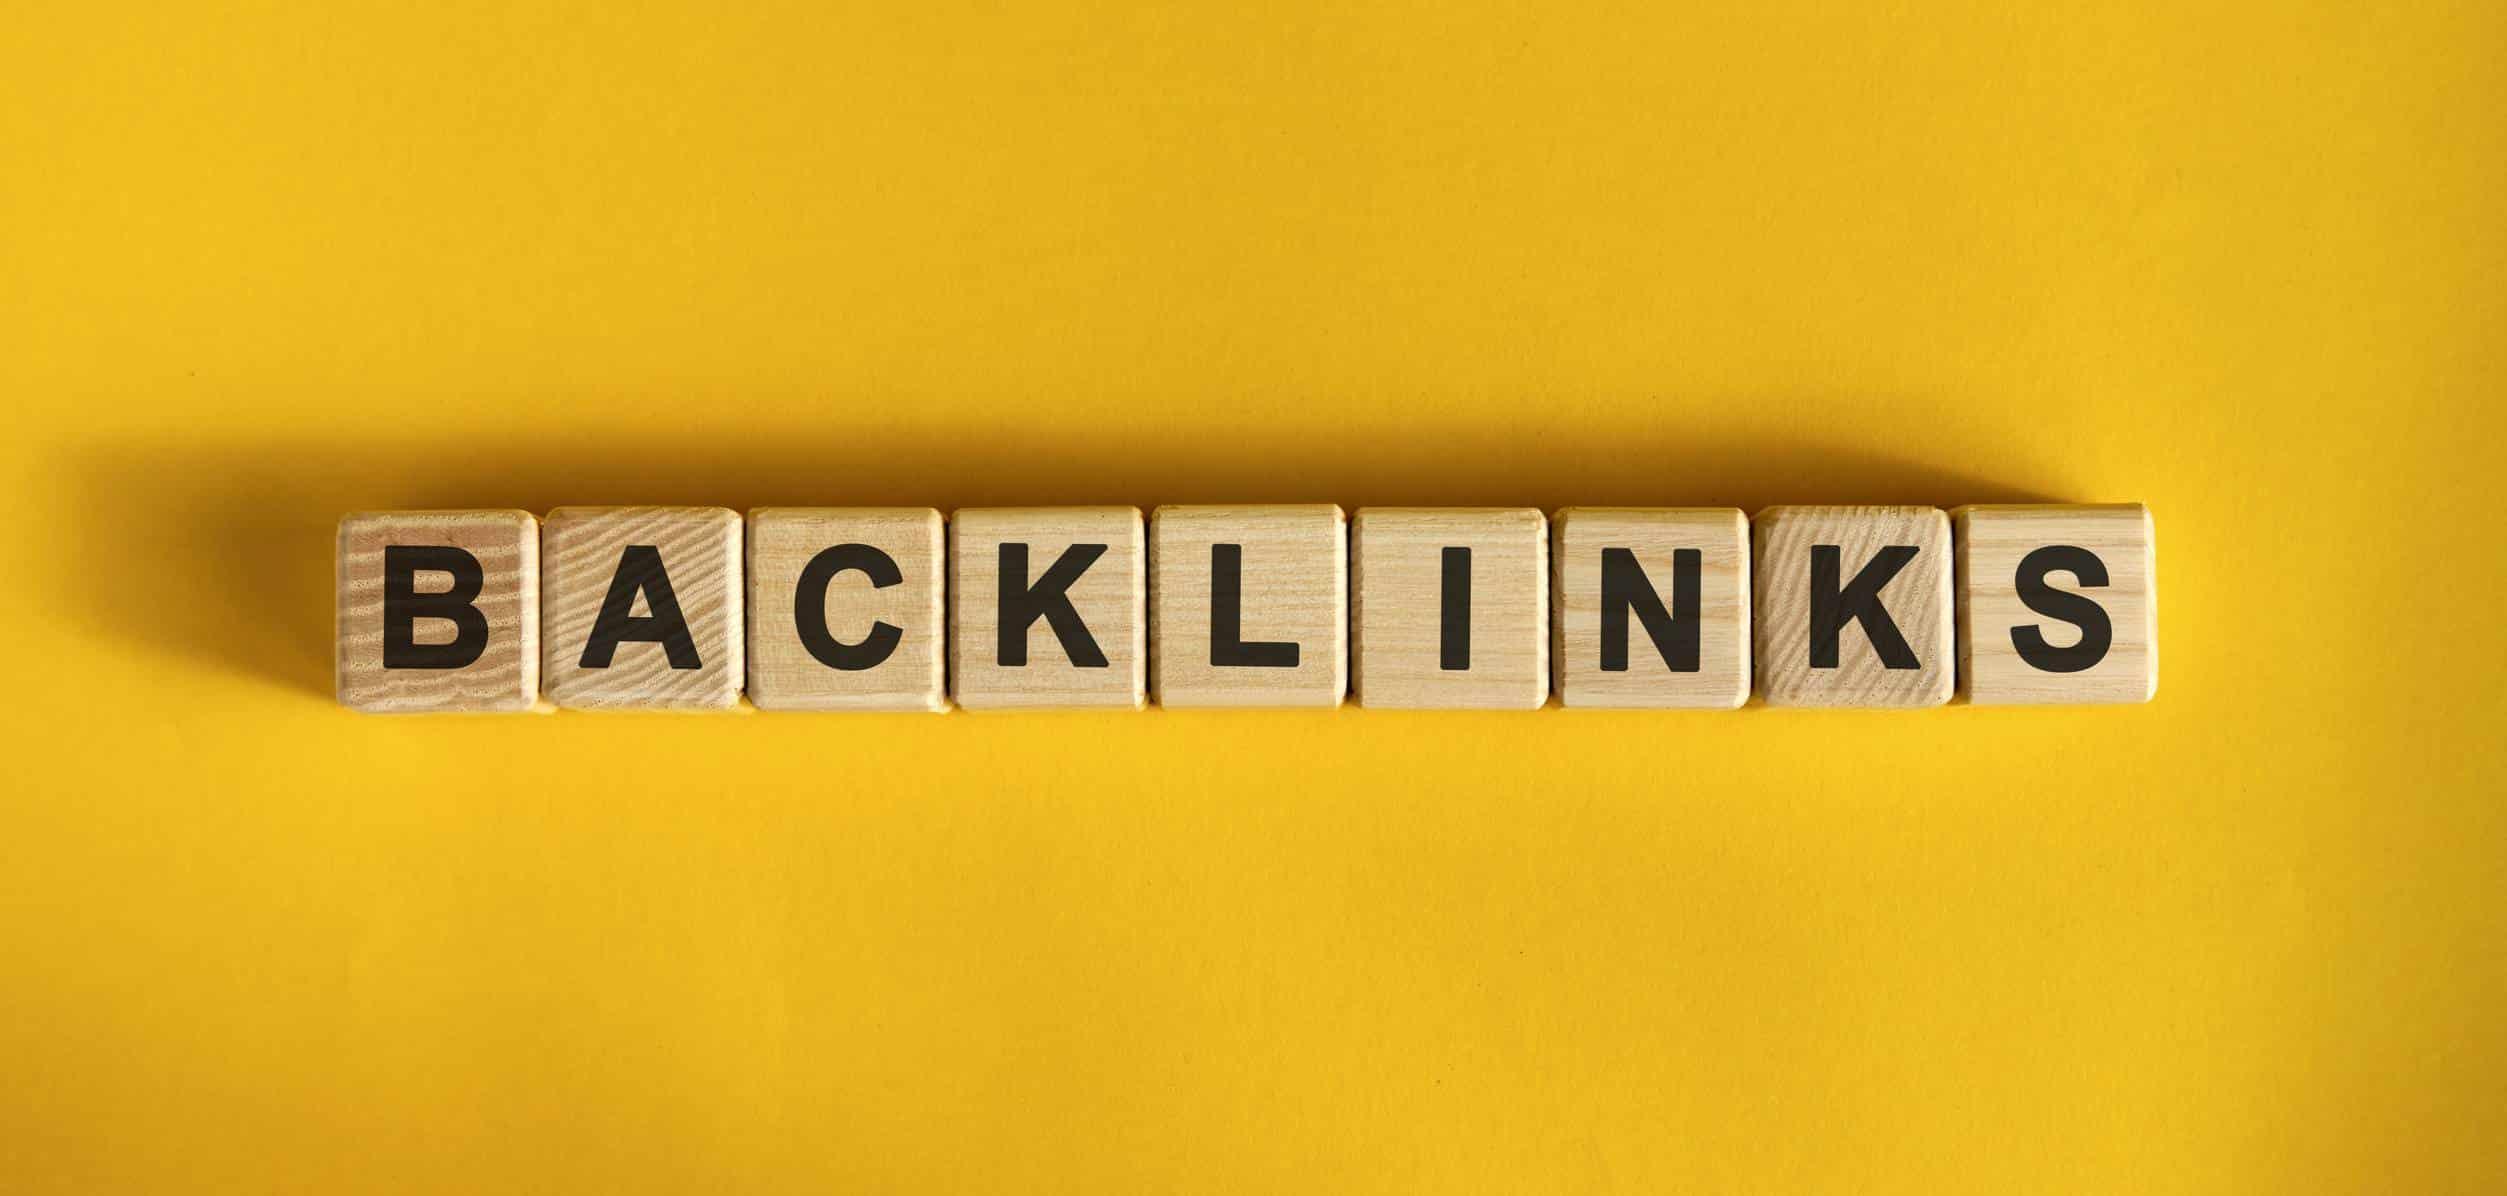 backlinks, stratégie de netlinking